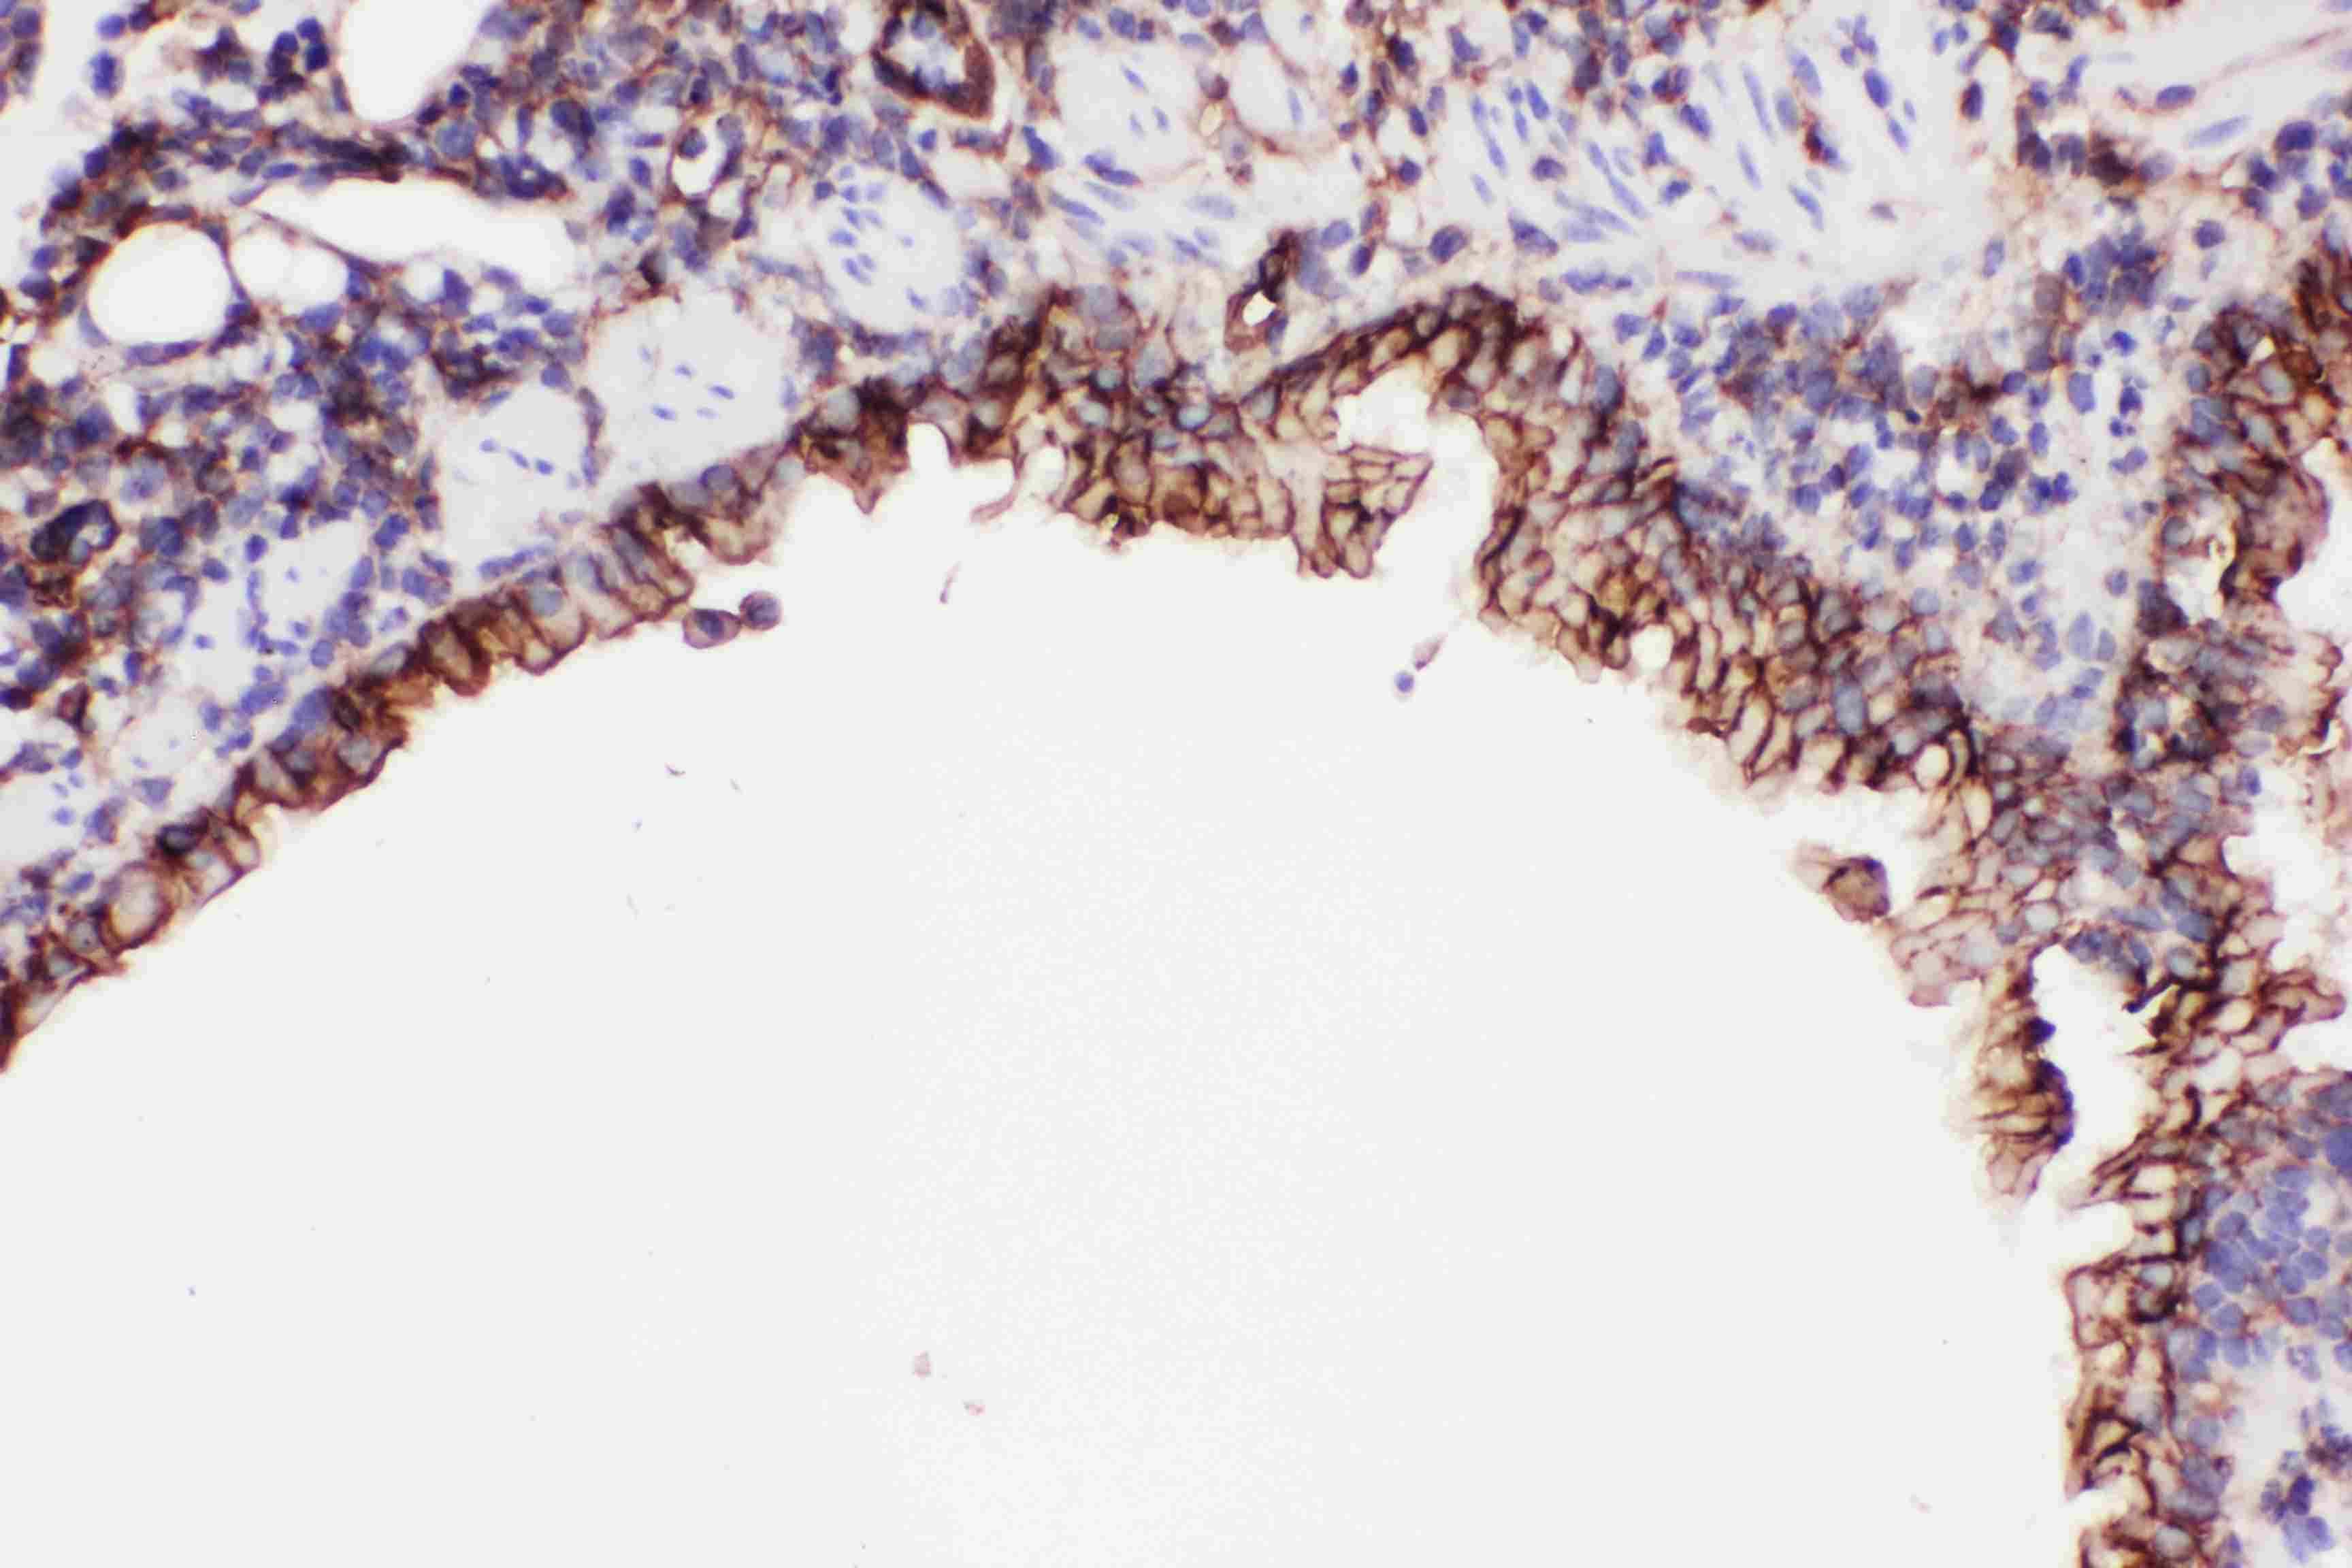 ICAM-1 (CD54) Antibody in Immunohistochemistry (Paraffin) (IHC (P))